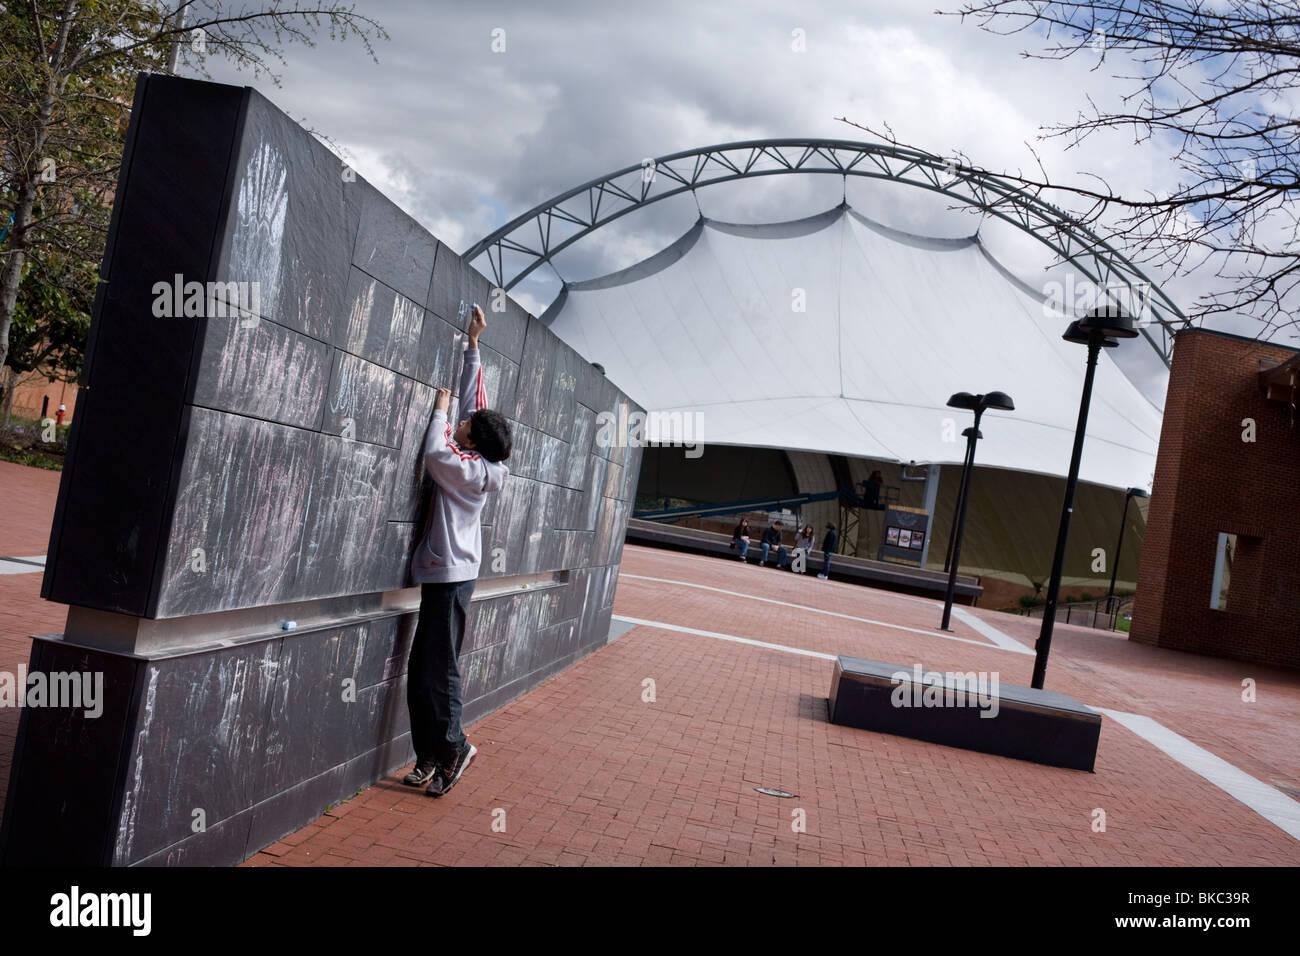 Junge stützt sich auf Community-Tafel und Podium, Downtown Mall, Pavillon hinter, Charlottesville, Virginia Stockbild